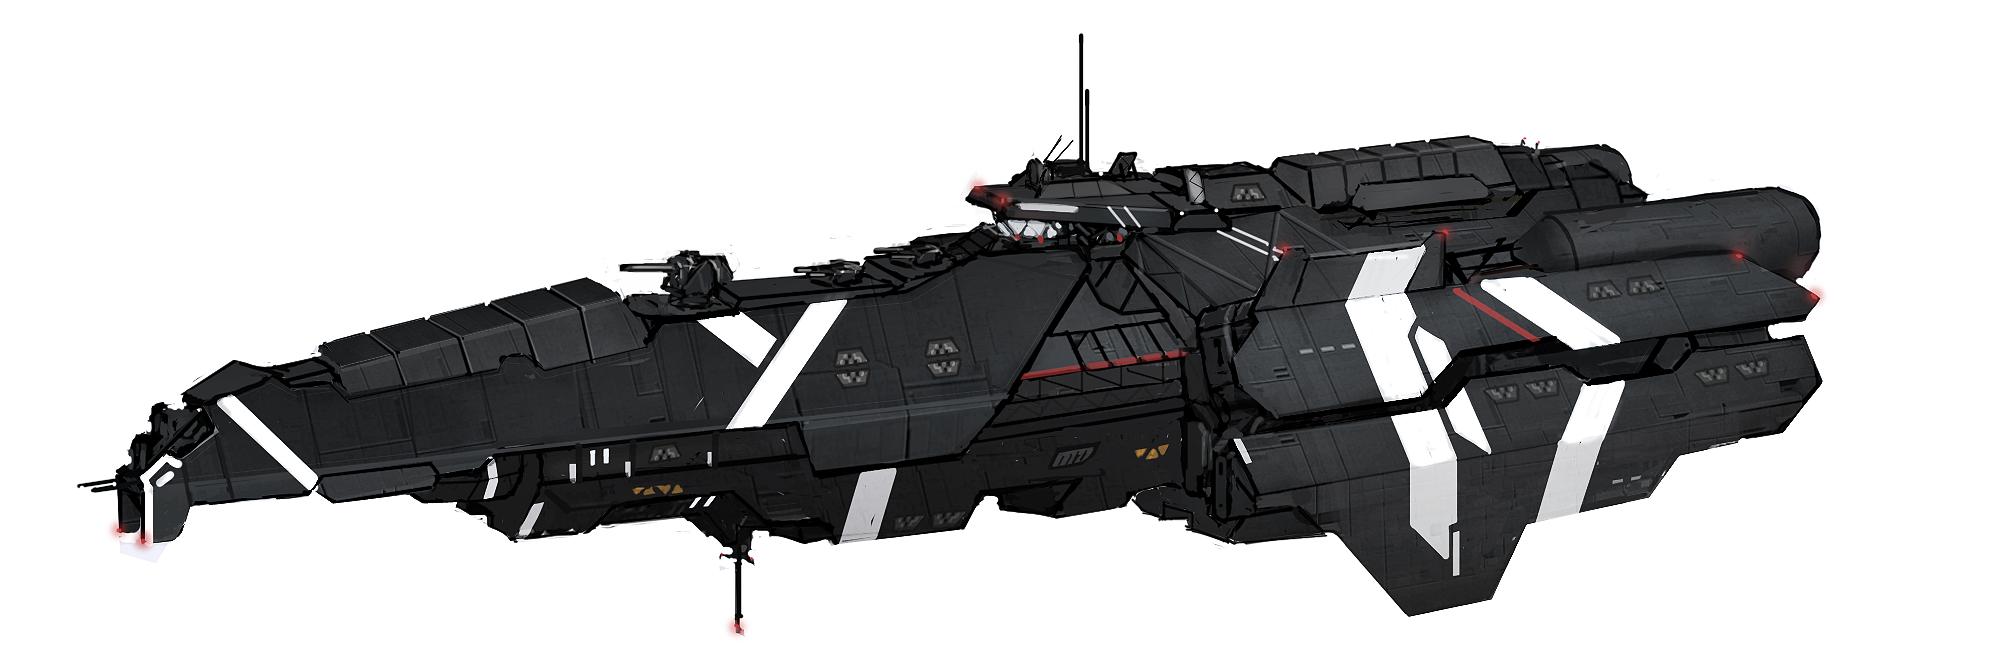 thanatos destroyer image